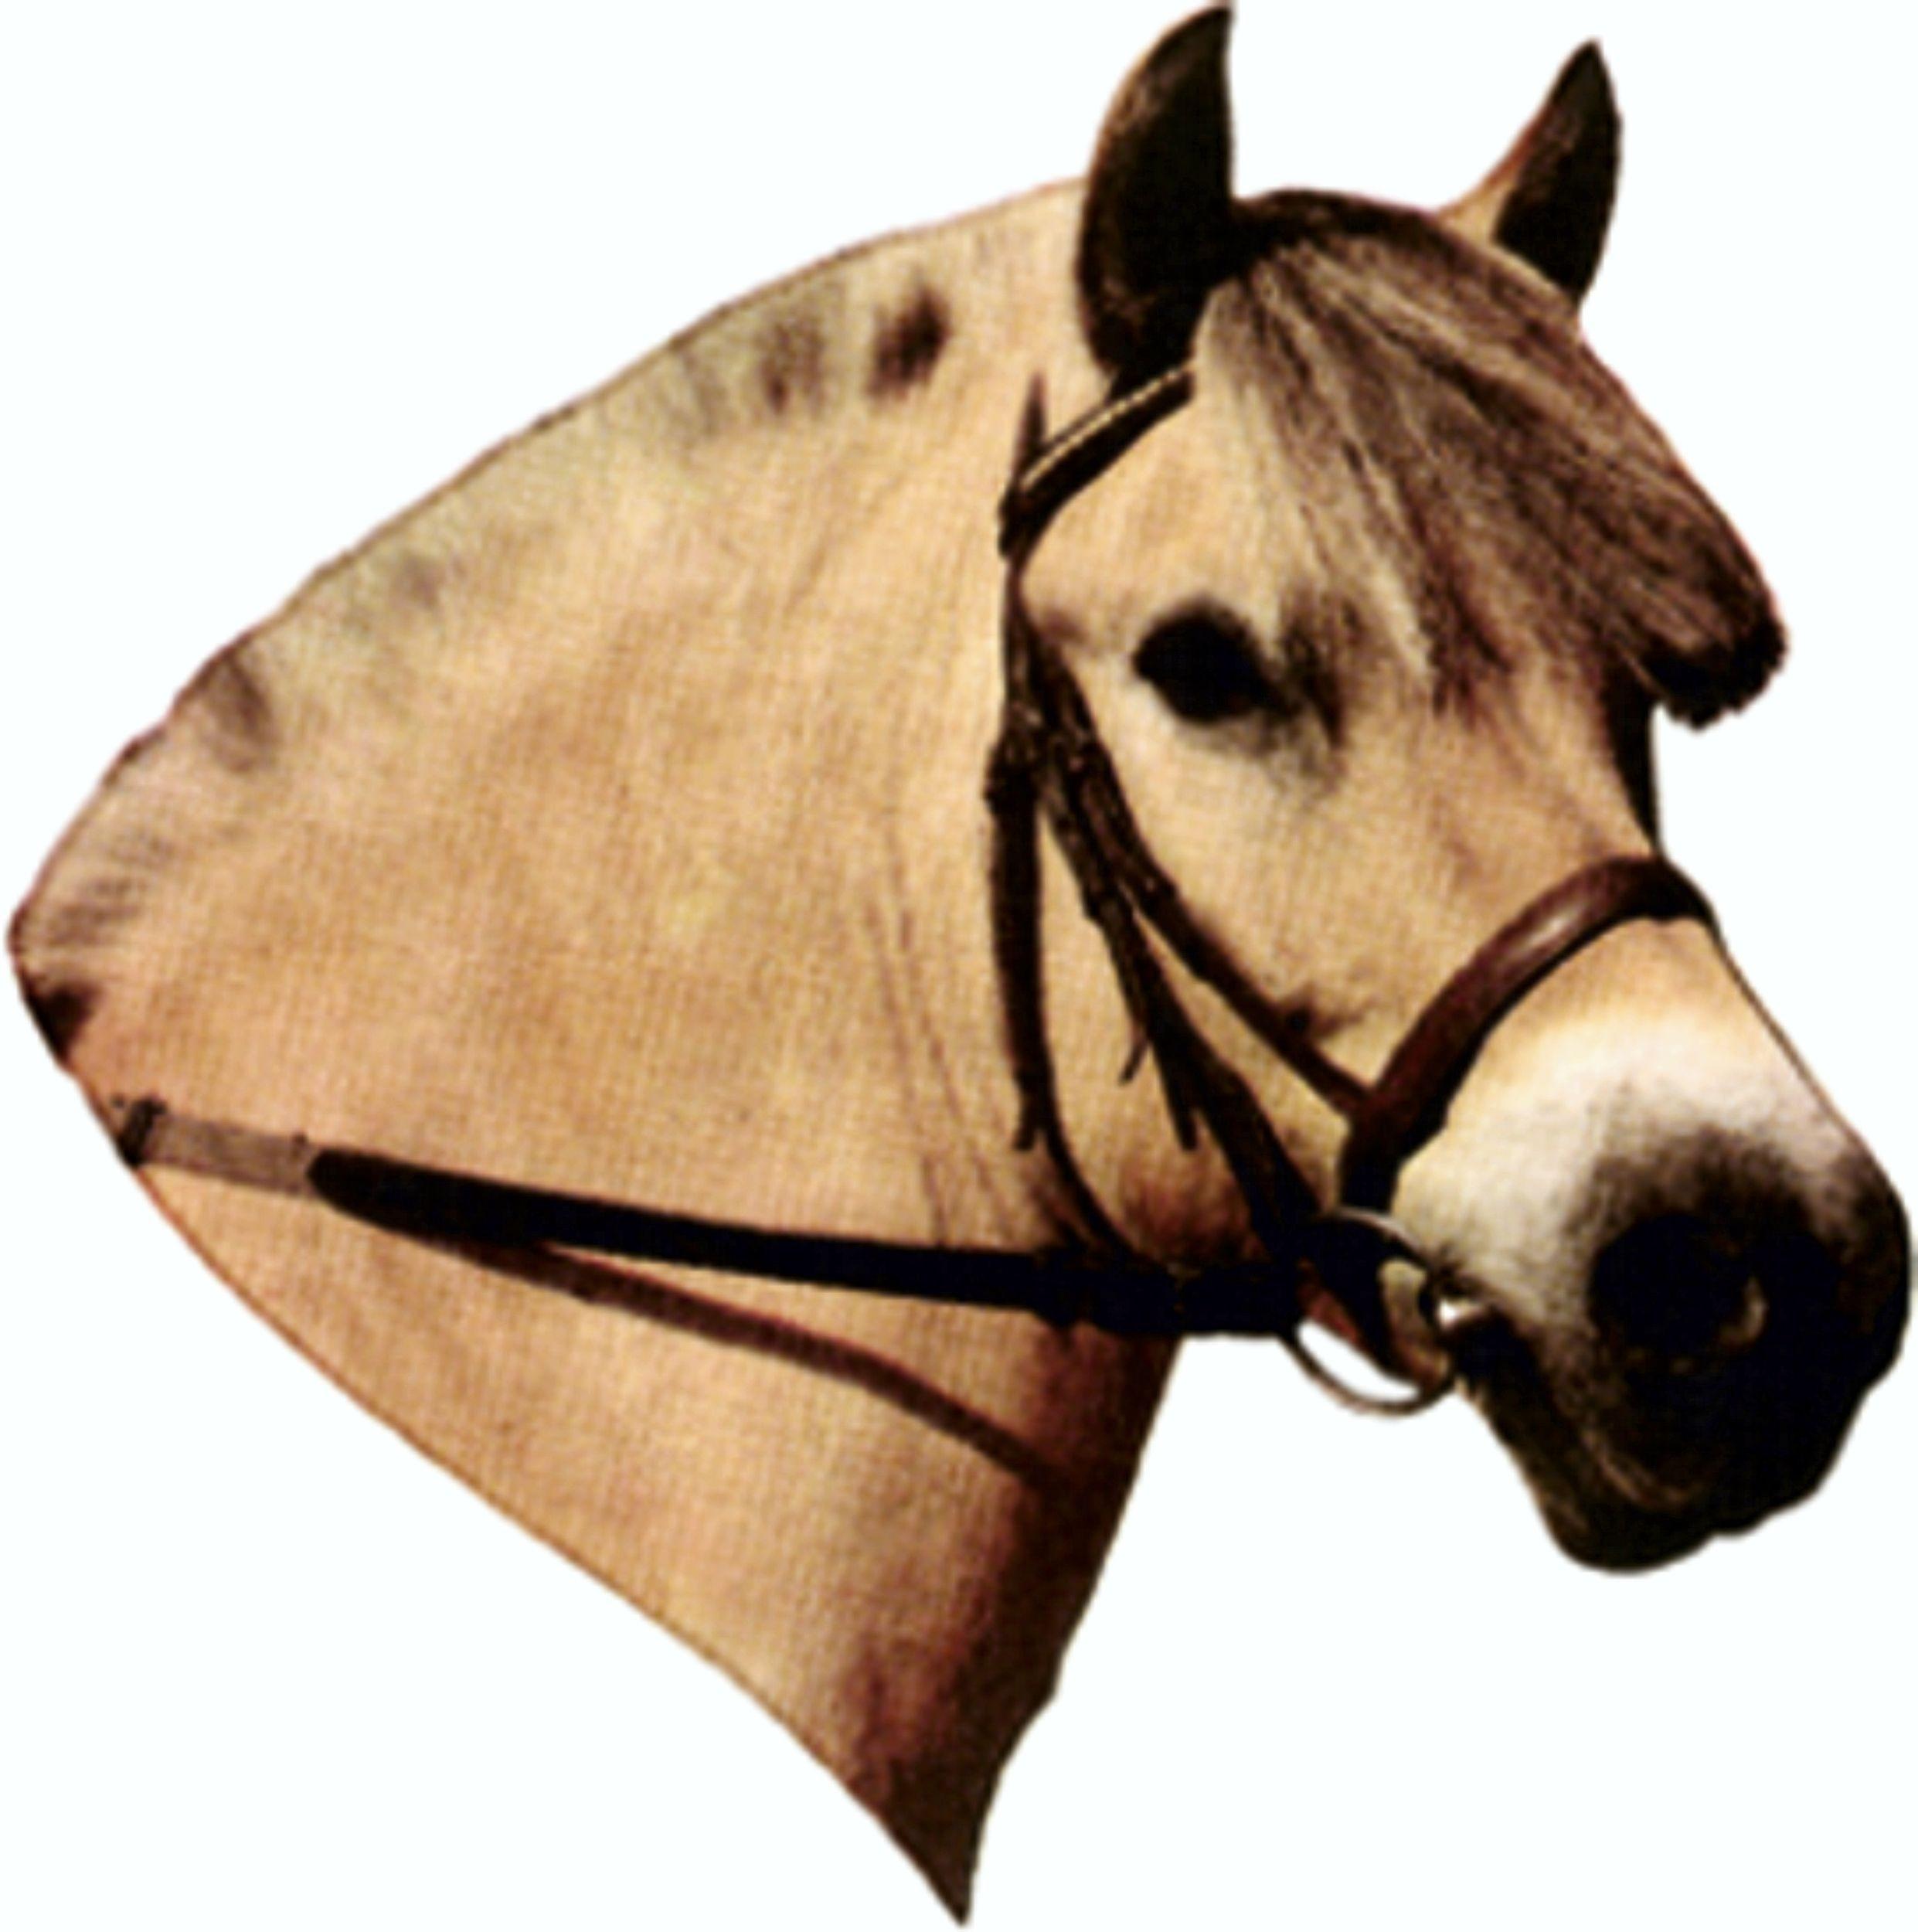 Autocollant cheval du fjord 125 x 110 mm – Bild 1